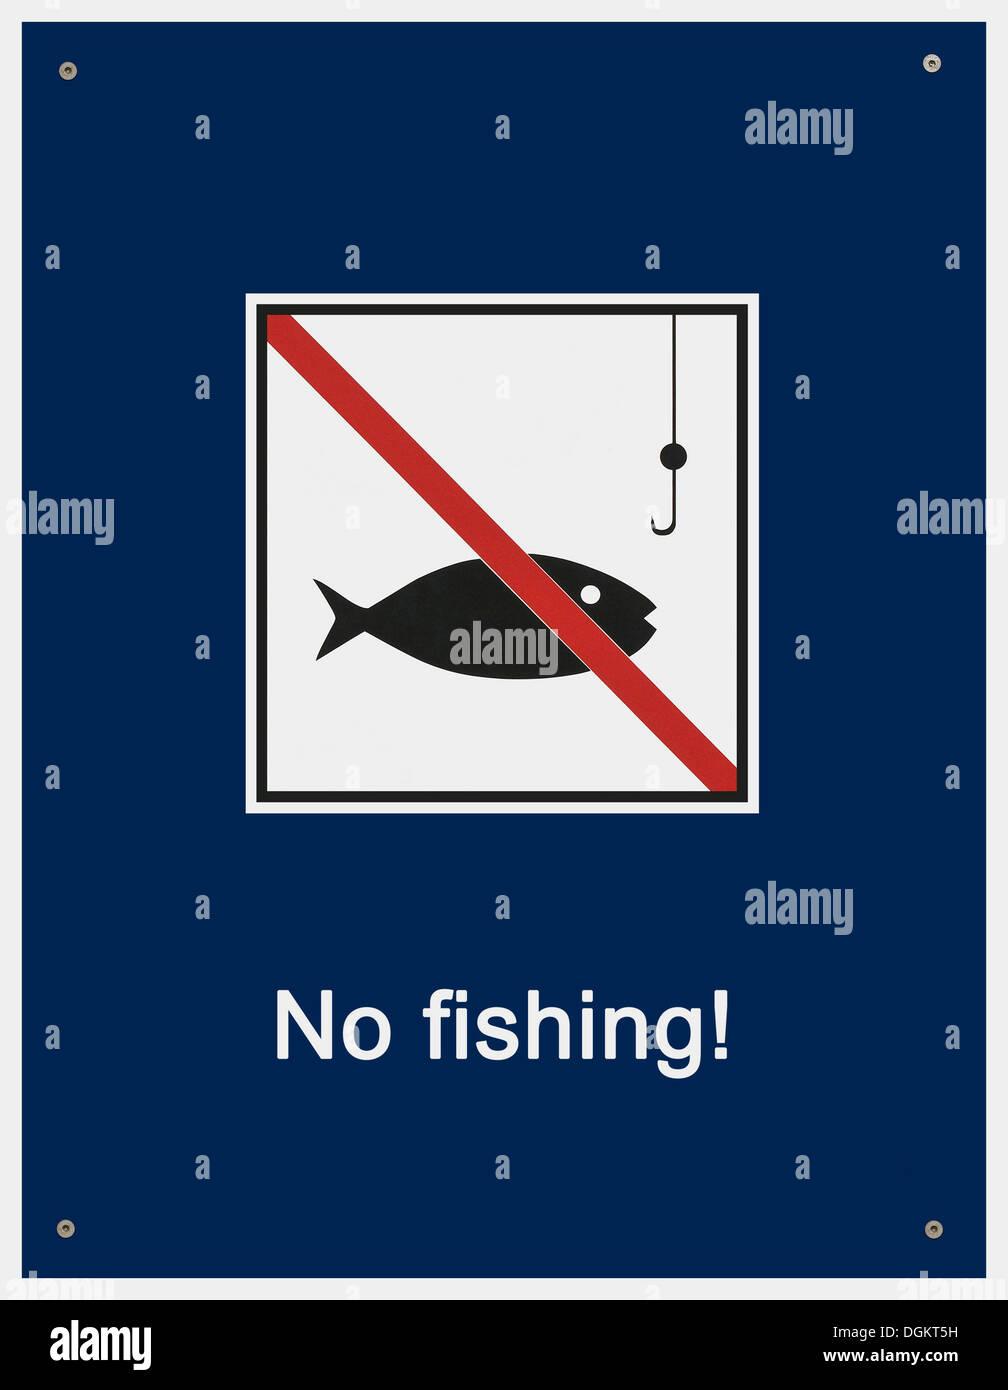 Sign, No fishing! - Stock Image